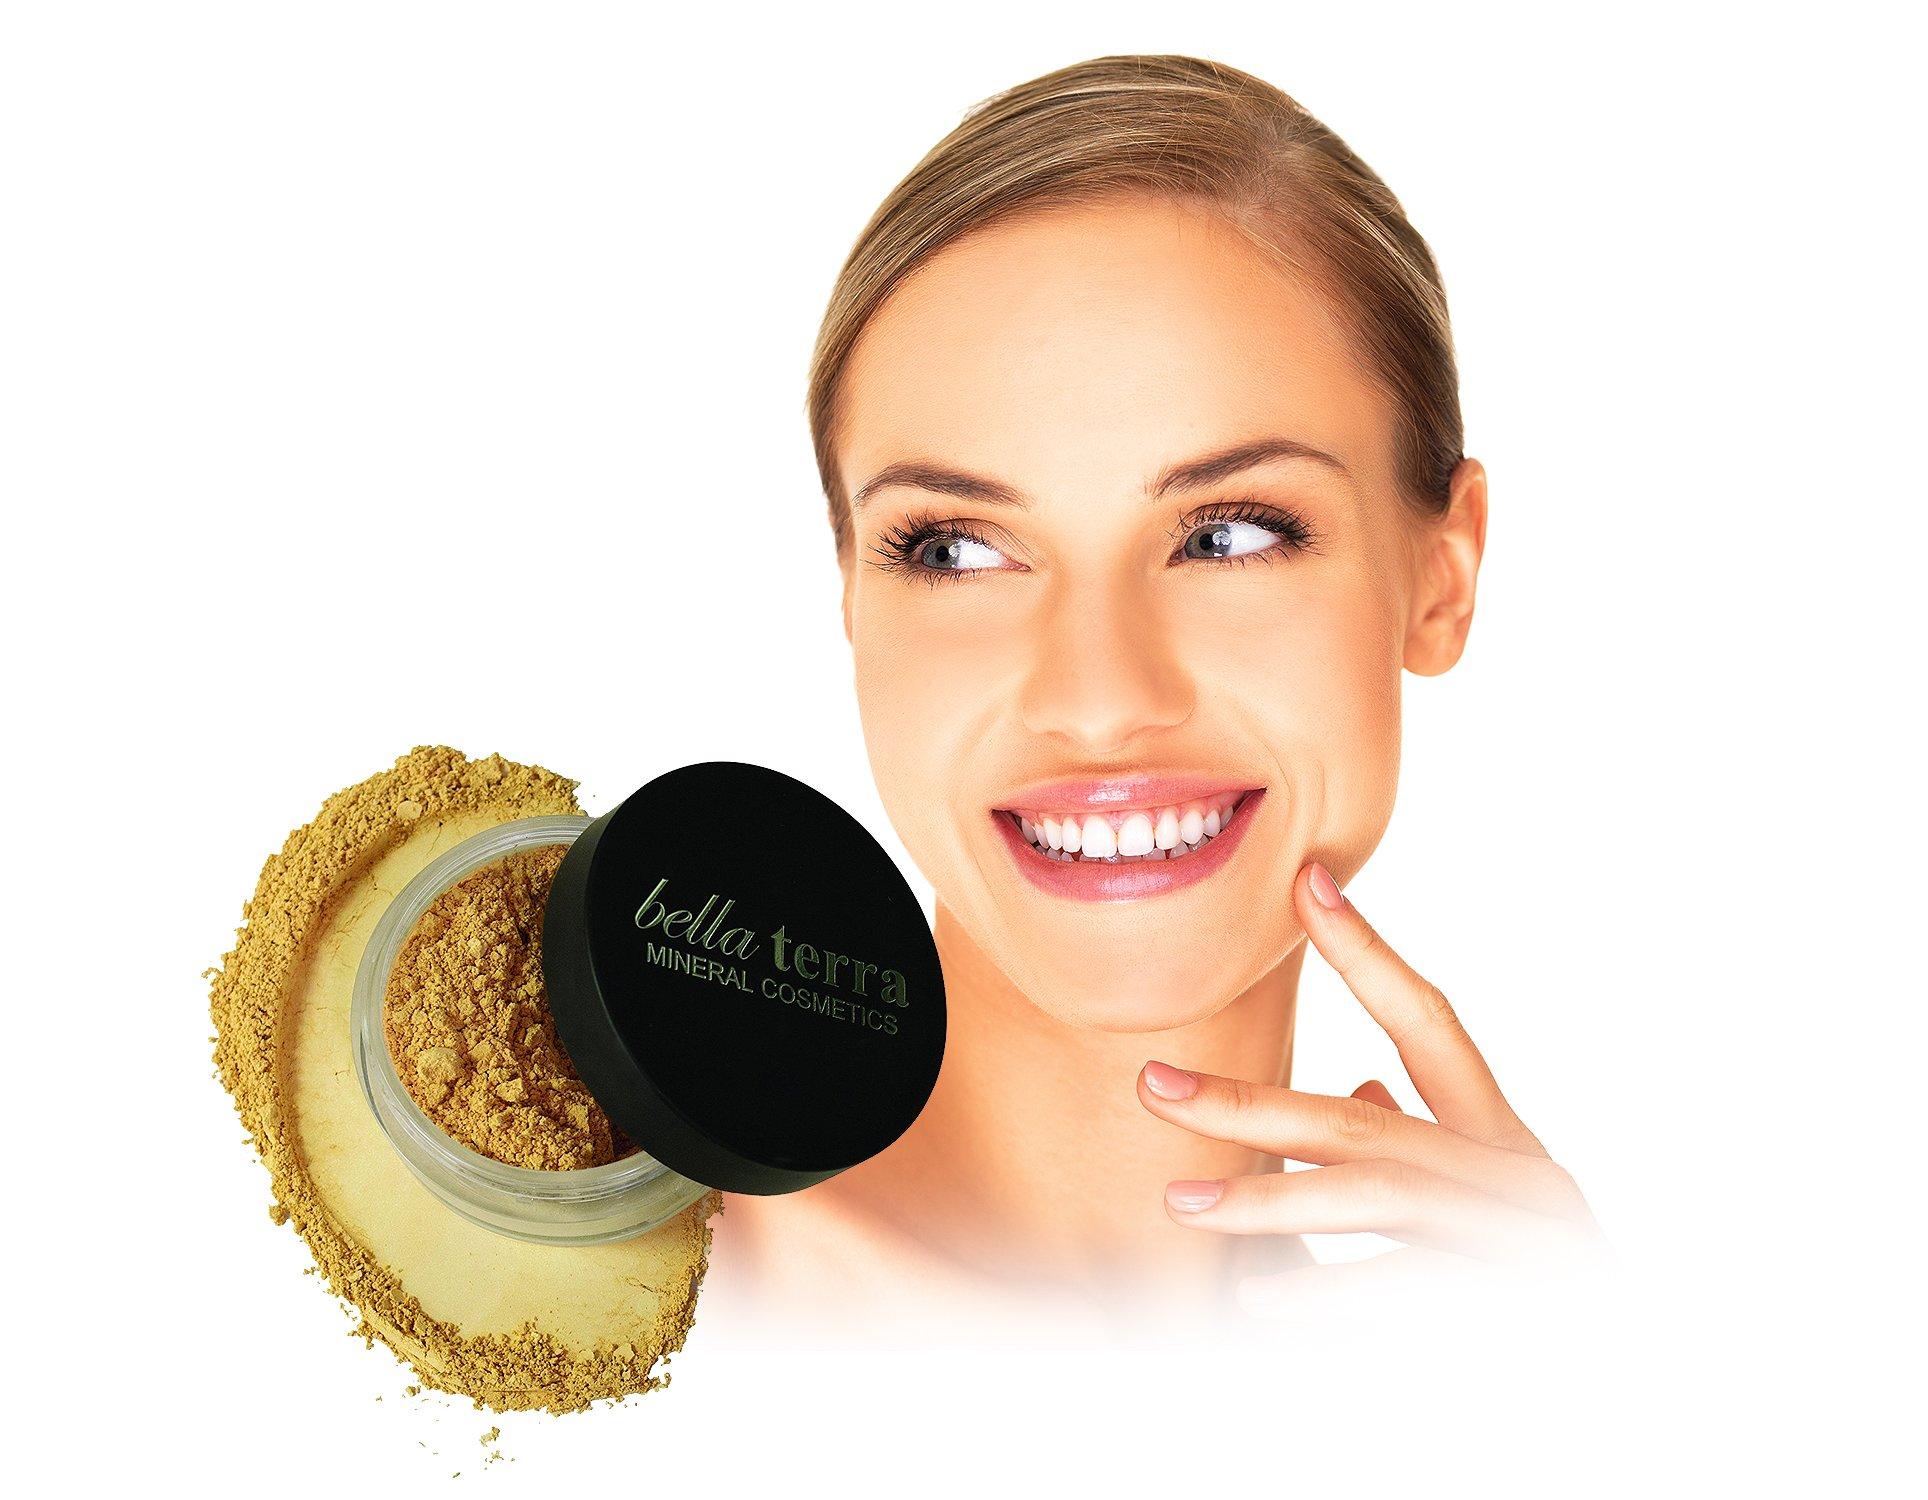 Bella Terra Cosmetics Foundation Brush Beauty Ql Cosmetic Eyebrow Cream 15 Gr Mineral Powder Long Lasting All Day Wear Buildable Sheer